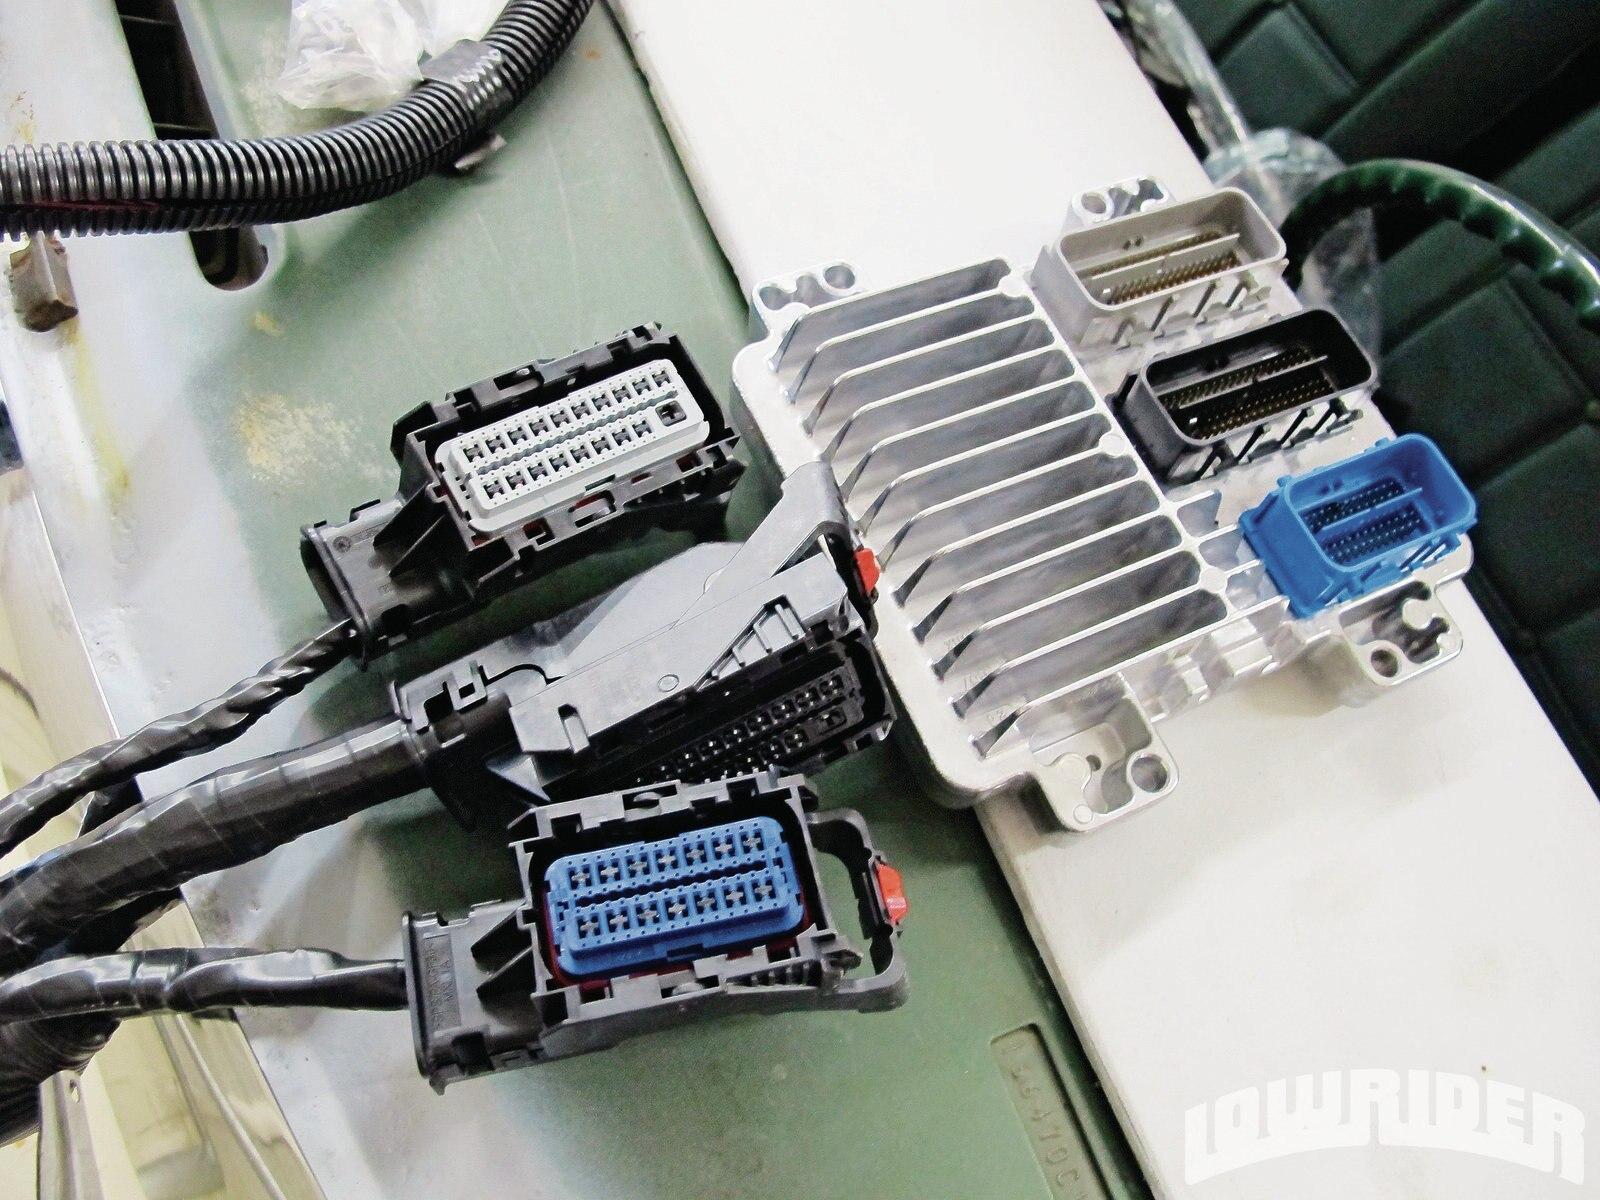 medium resolution of 1204 lrmp 25 o gm performance ls3 harness and engine computer lowrider rh lowrider com lq9 wiring harness diagram ls3 engine harness